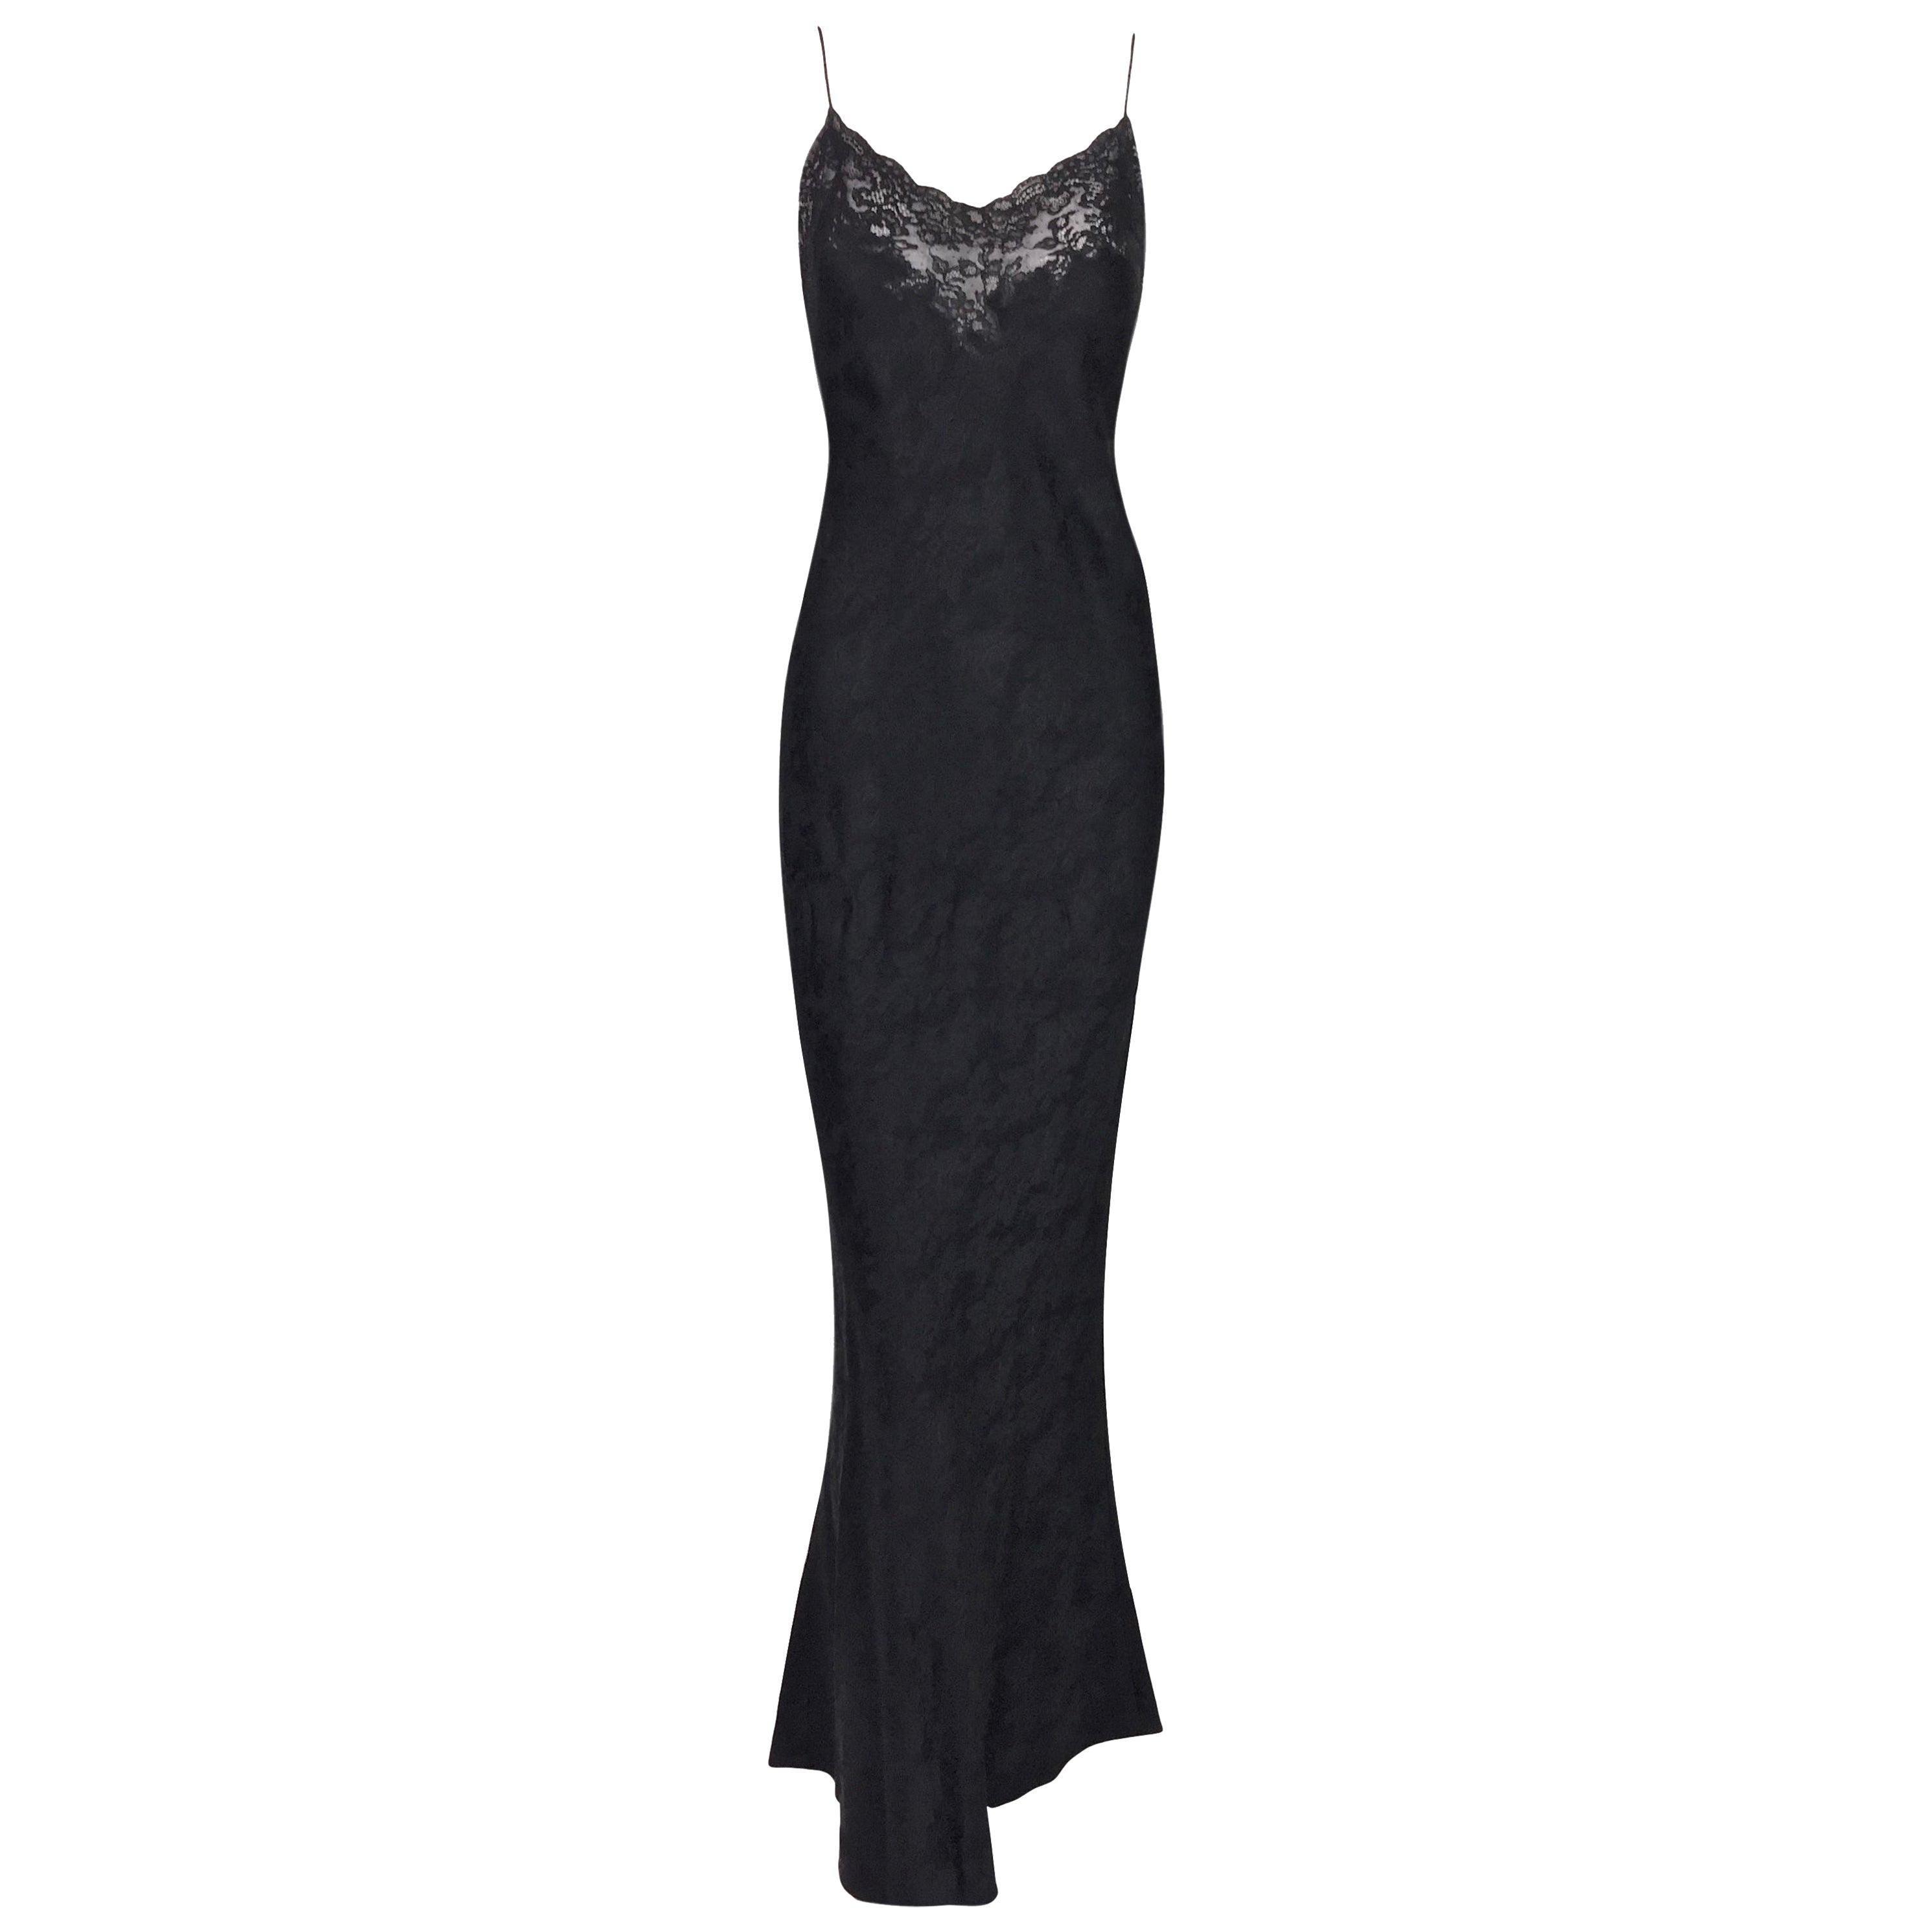 F/W 1998 Christian Dior John Galliano Sheer Lace Black Plunging Long Slip Dress